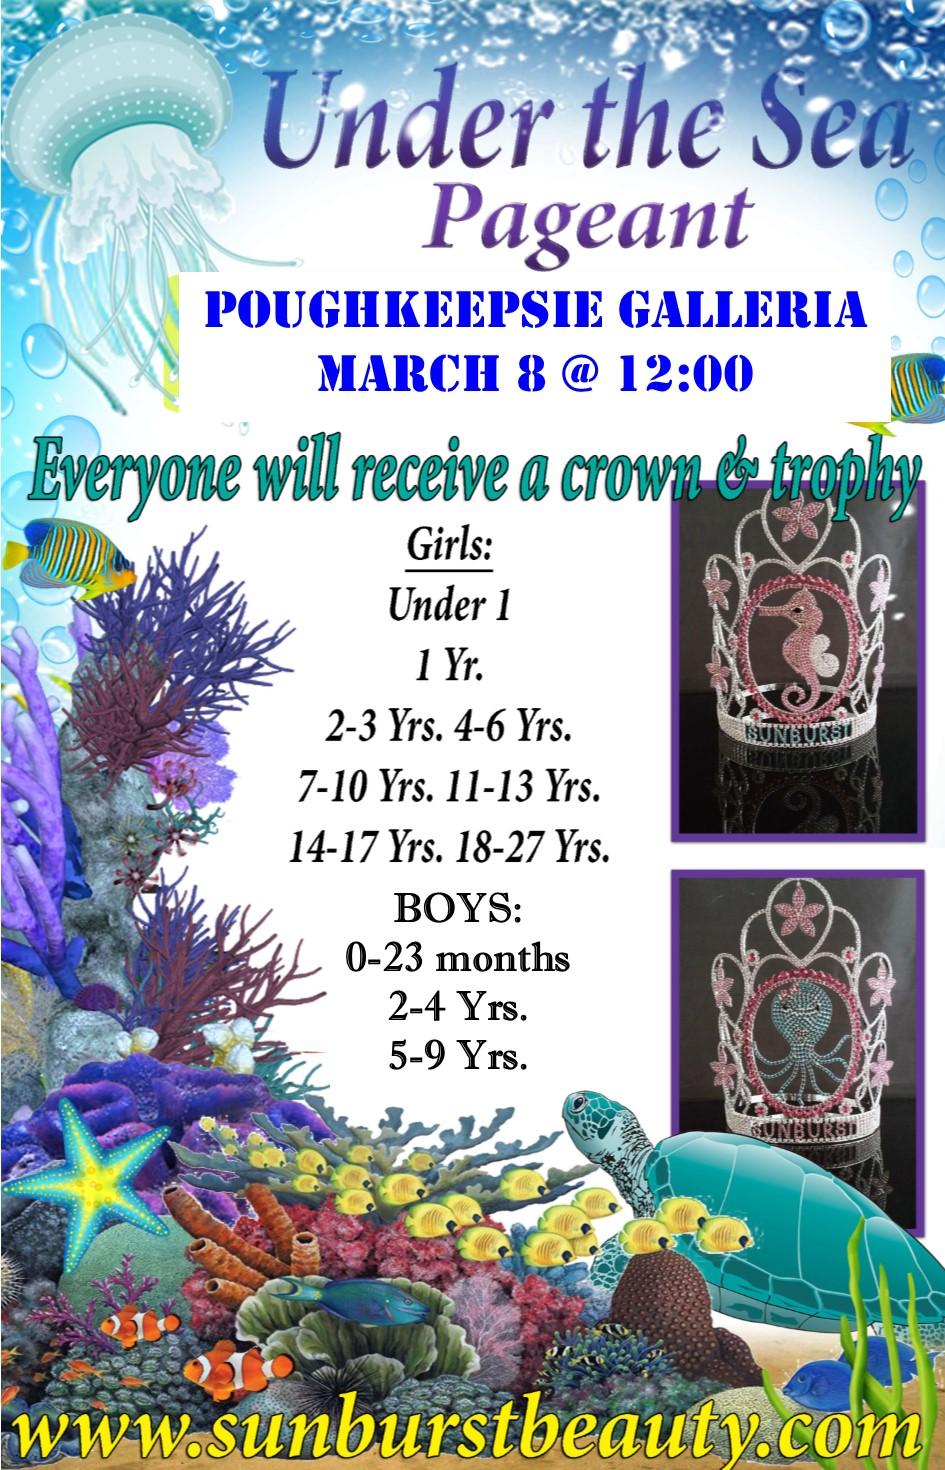 Poughkeepsie Galleria UTS web post 20